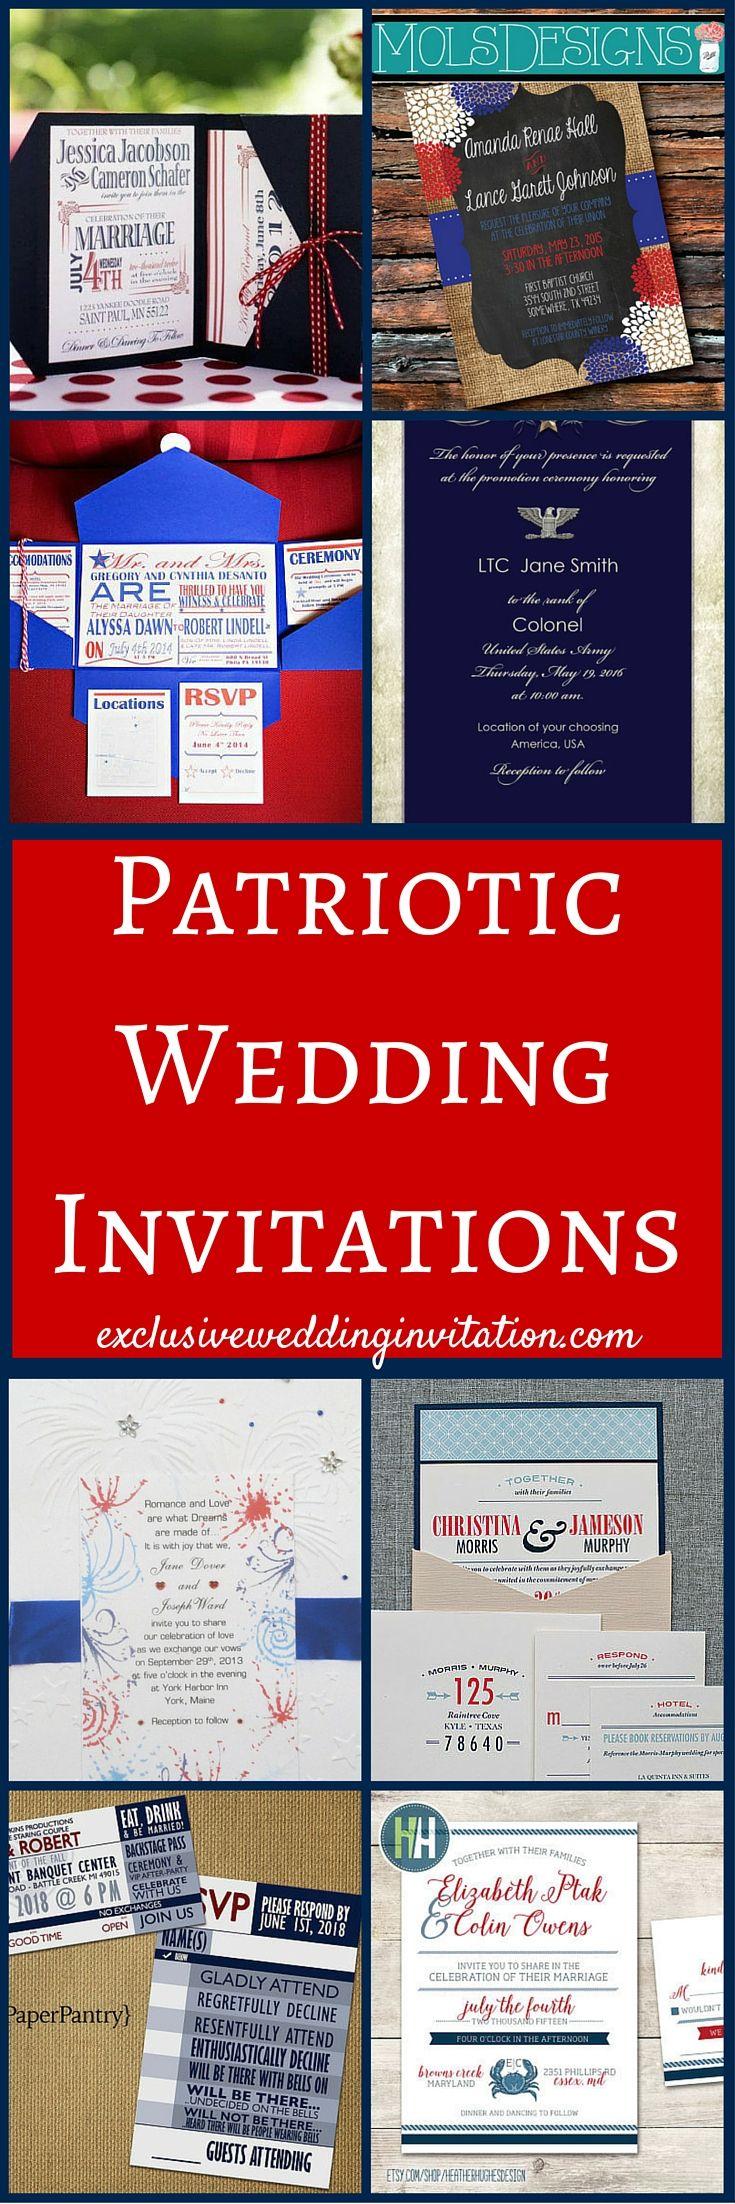 Patriotic Wedding Invitations | July wedding, Weddings and Vintage ...